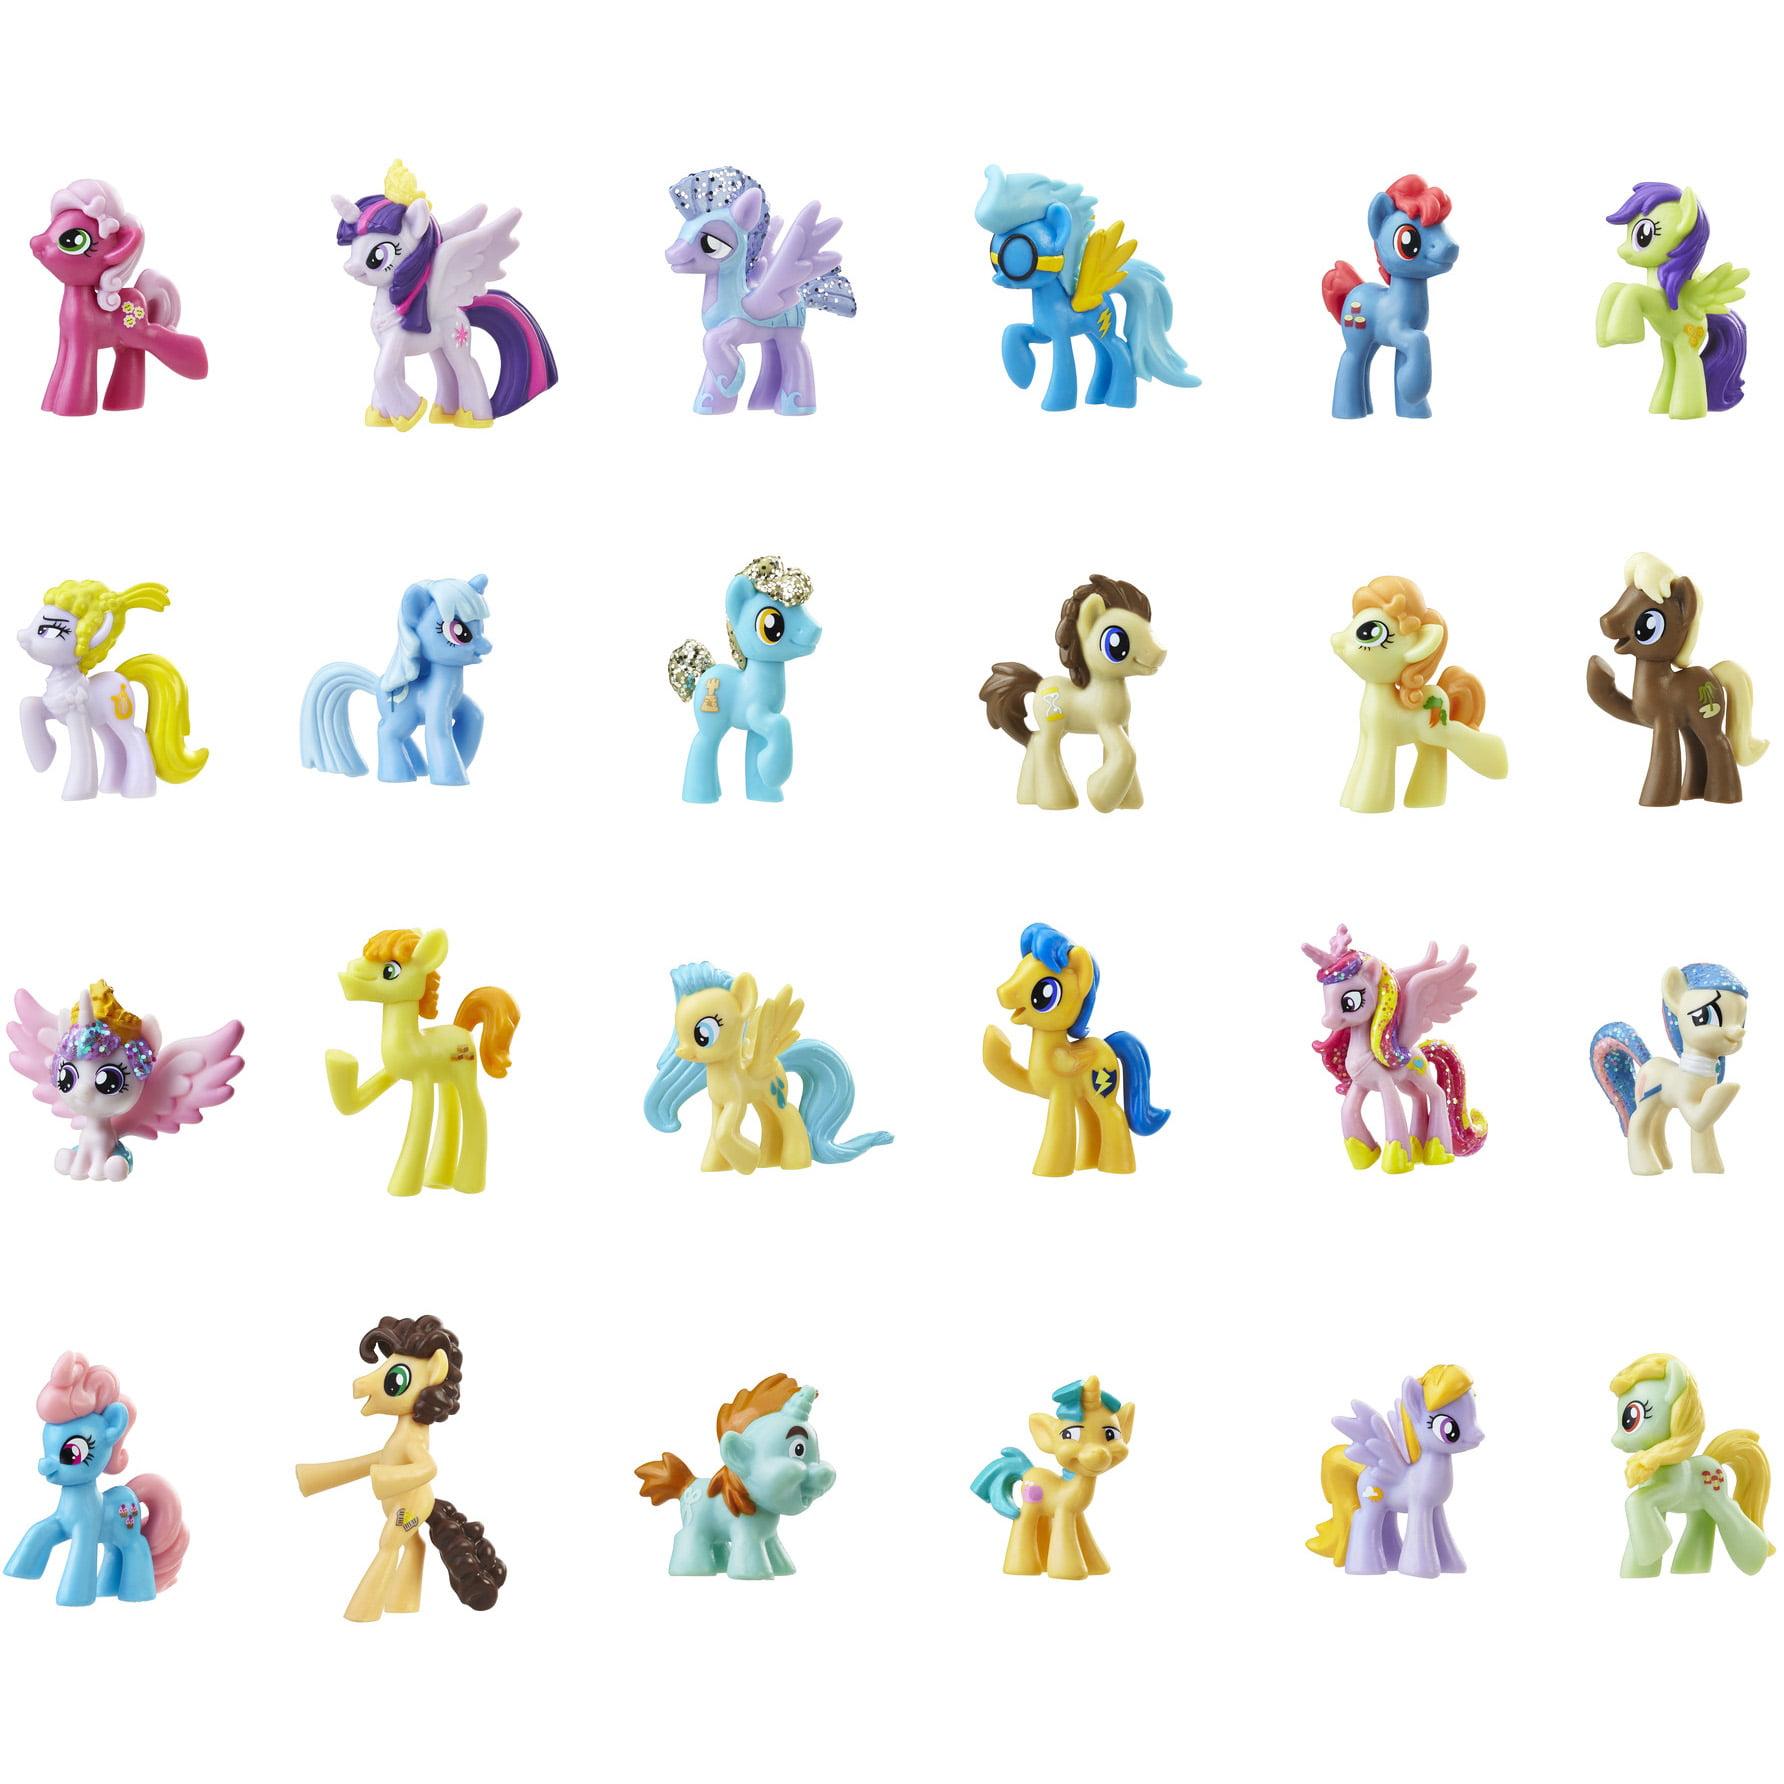 My Little Pony Friendship Is Magic Collection Blind Bags 2018 01 Walmart Com Walmart Com